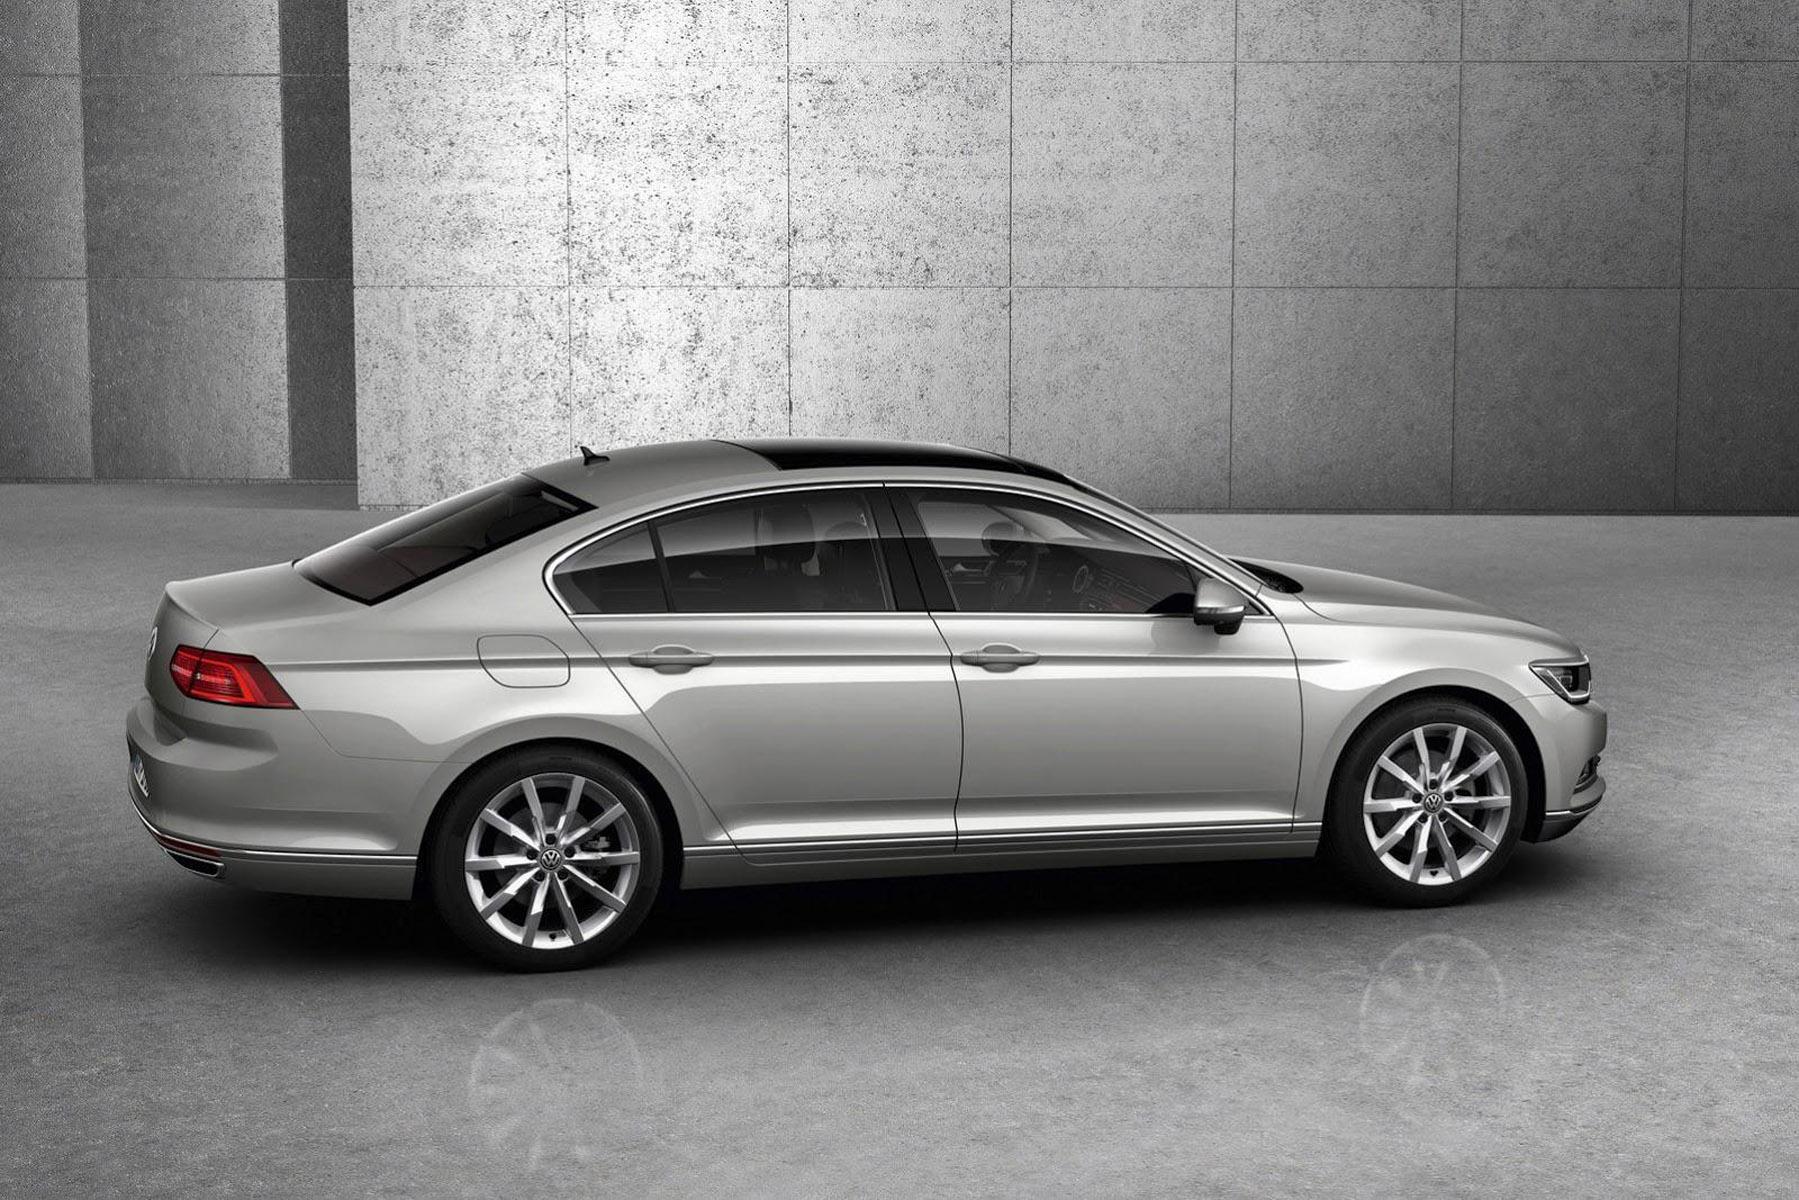 2015 Volkswagen Passat Officially Unveiled